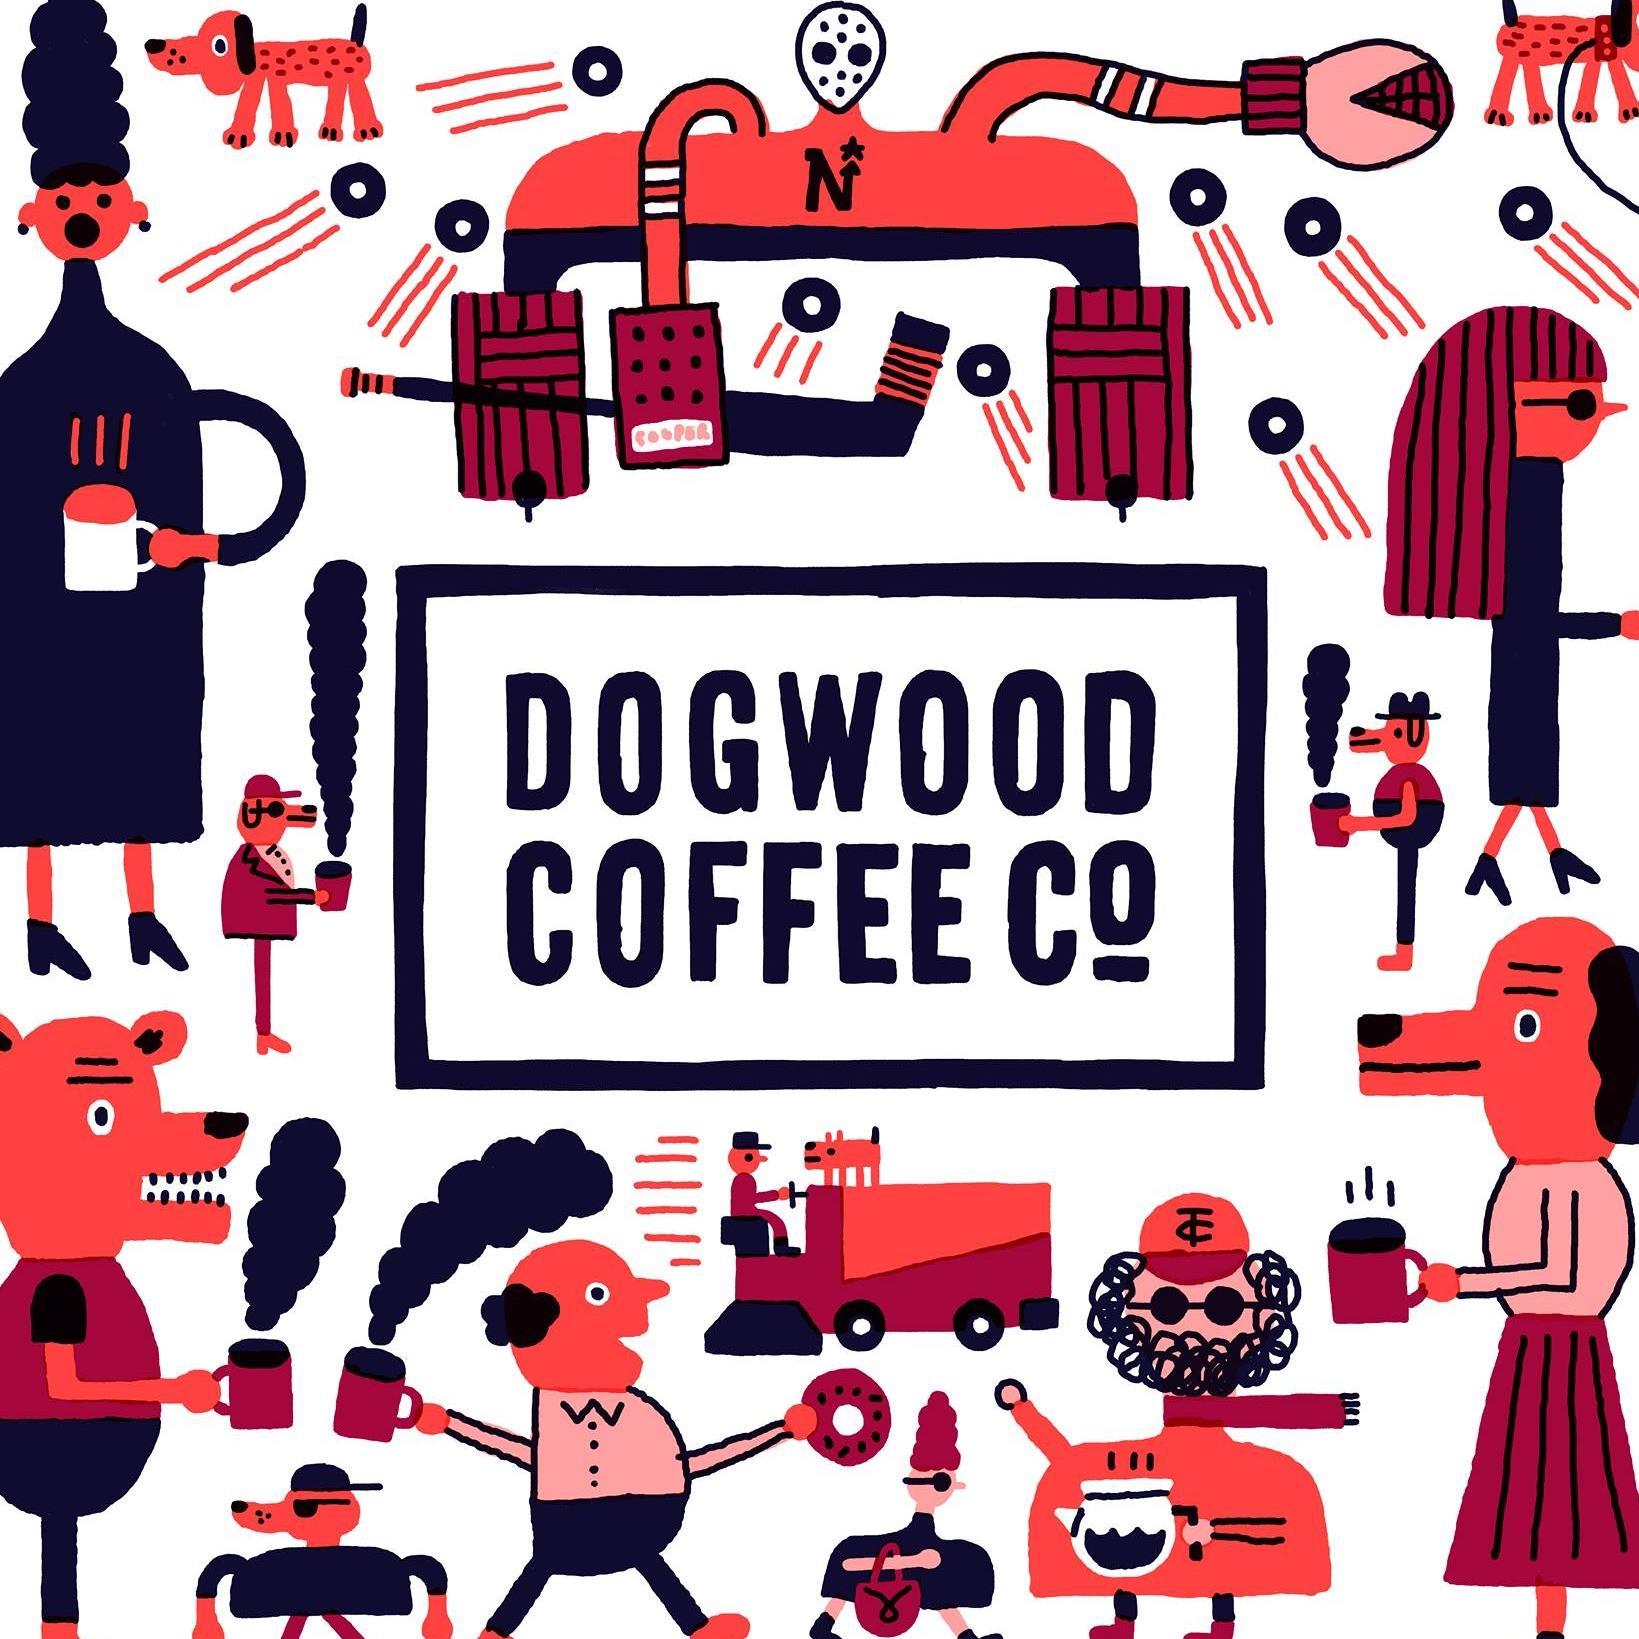 Dogwood Coffee Co